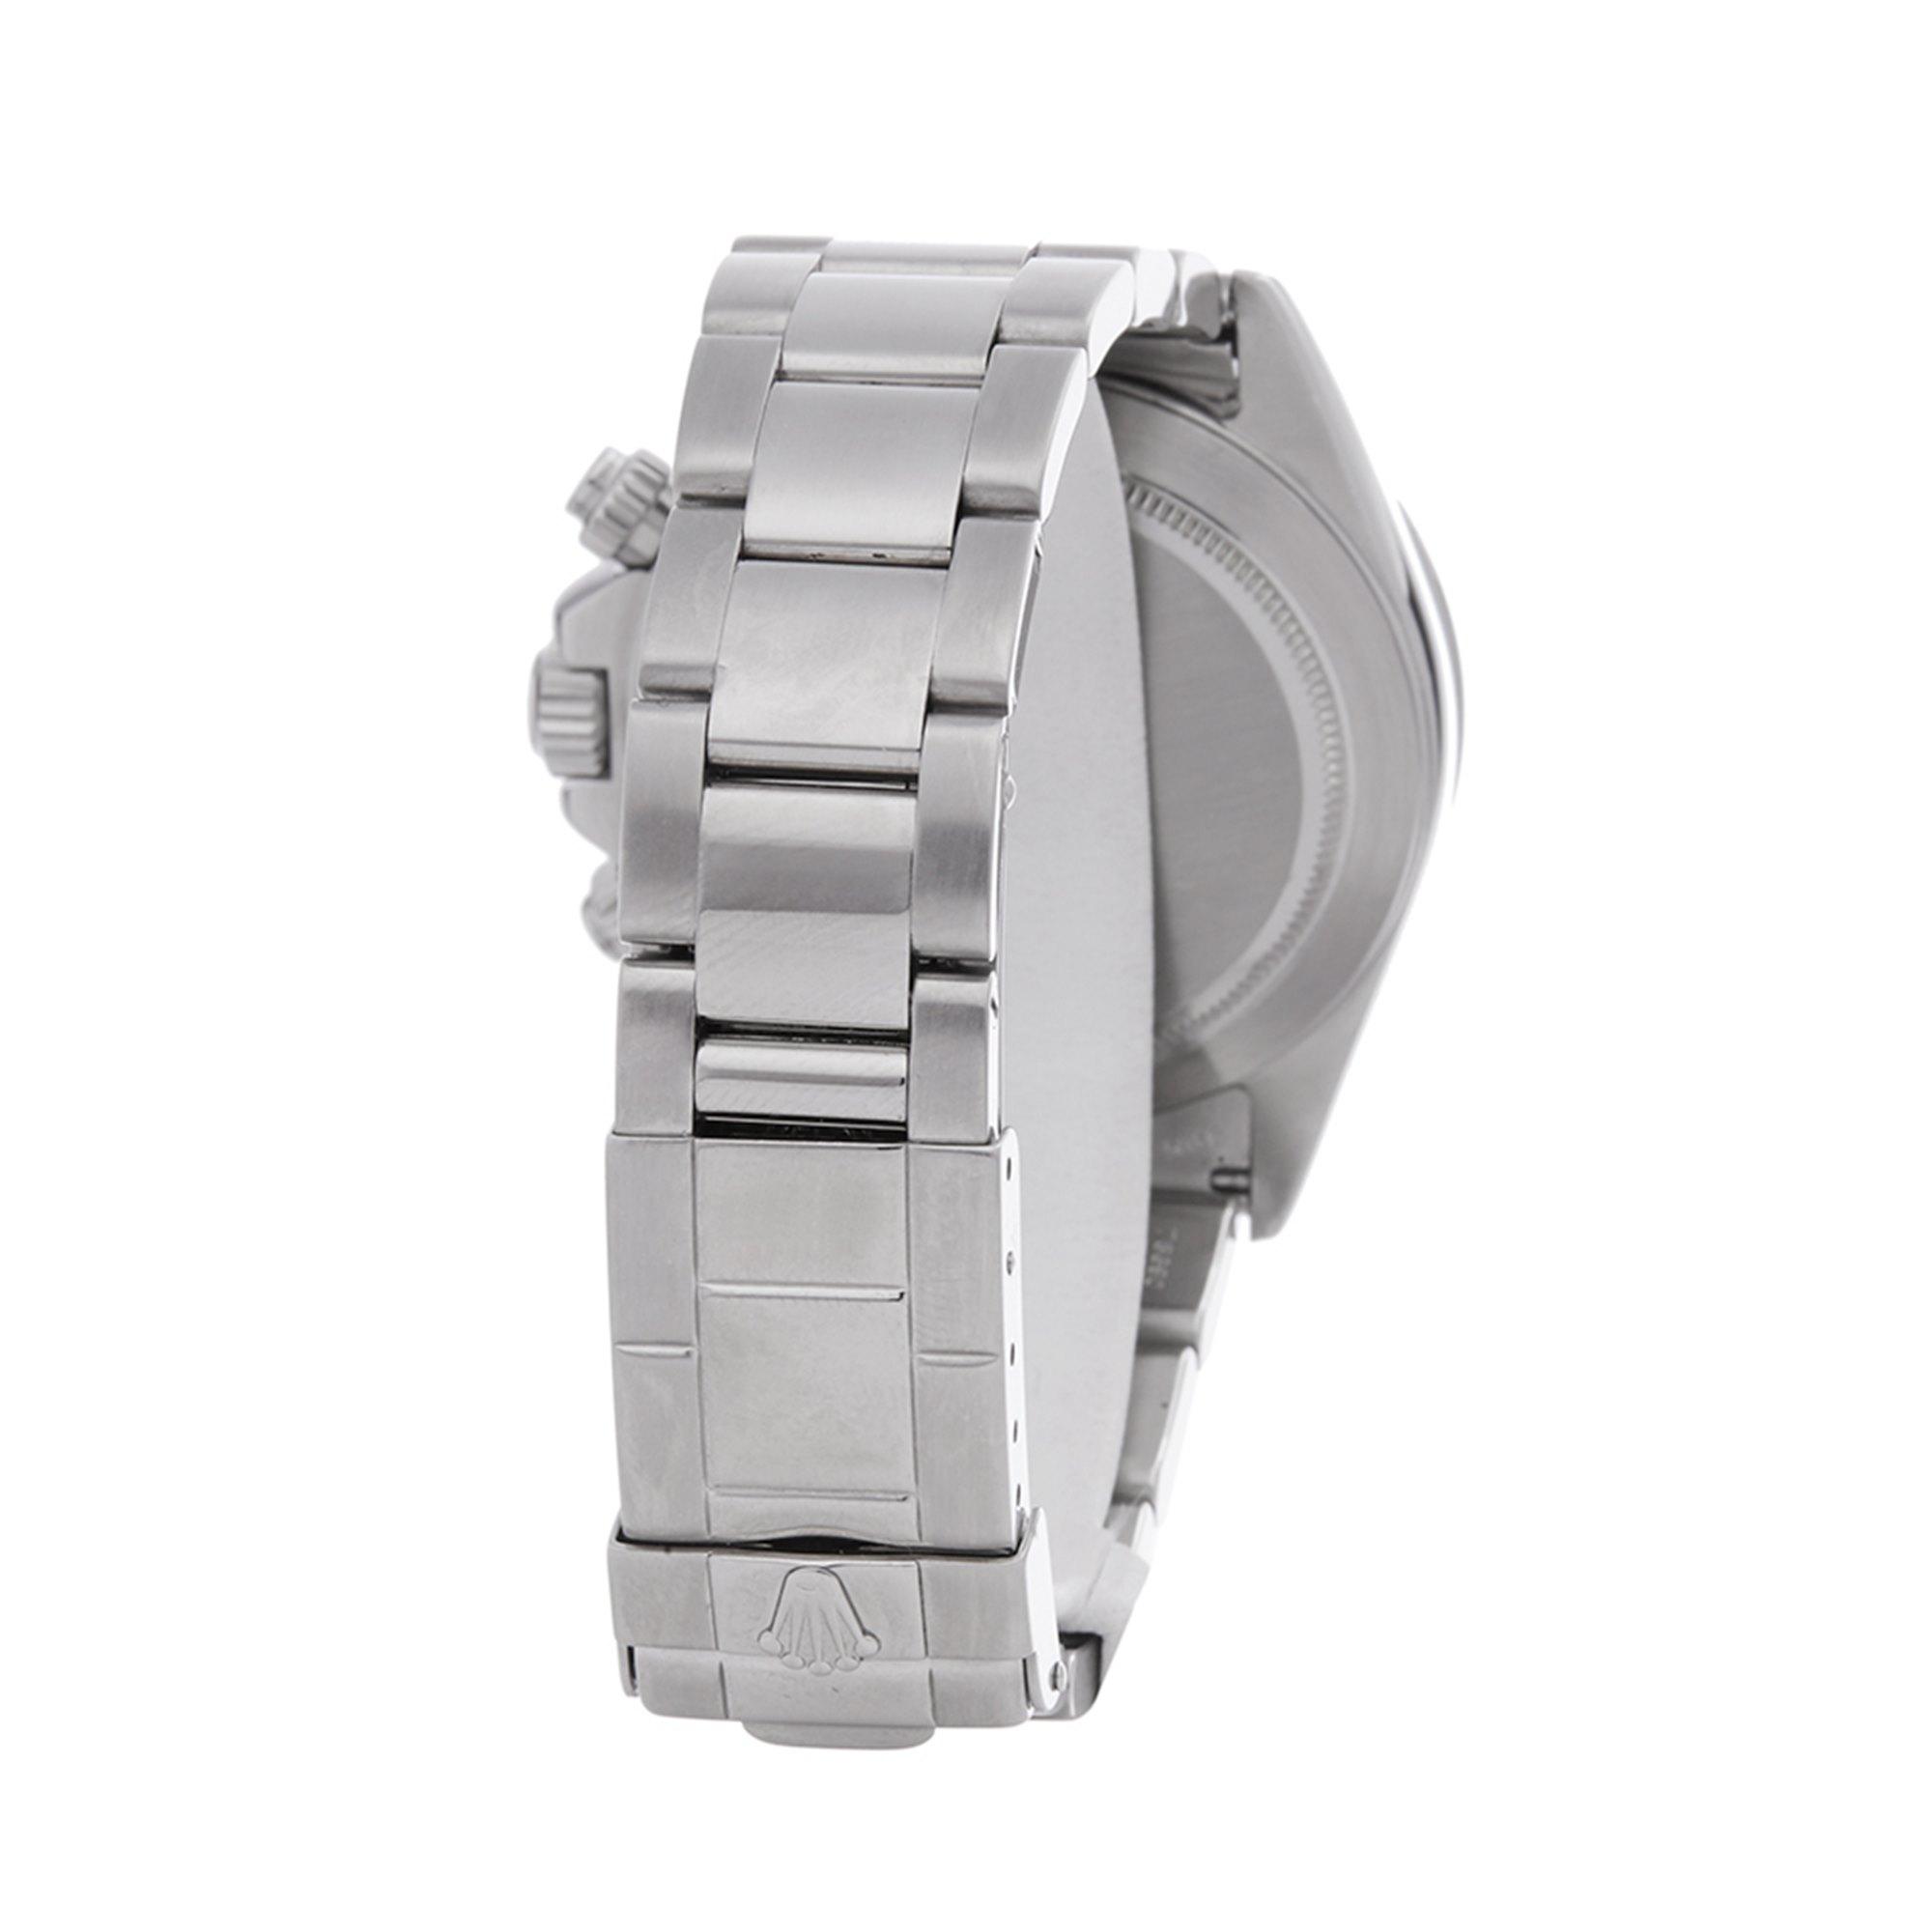 Rolex Daytona Patrizzi Zenith Chronograph Stainless Steel 16520